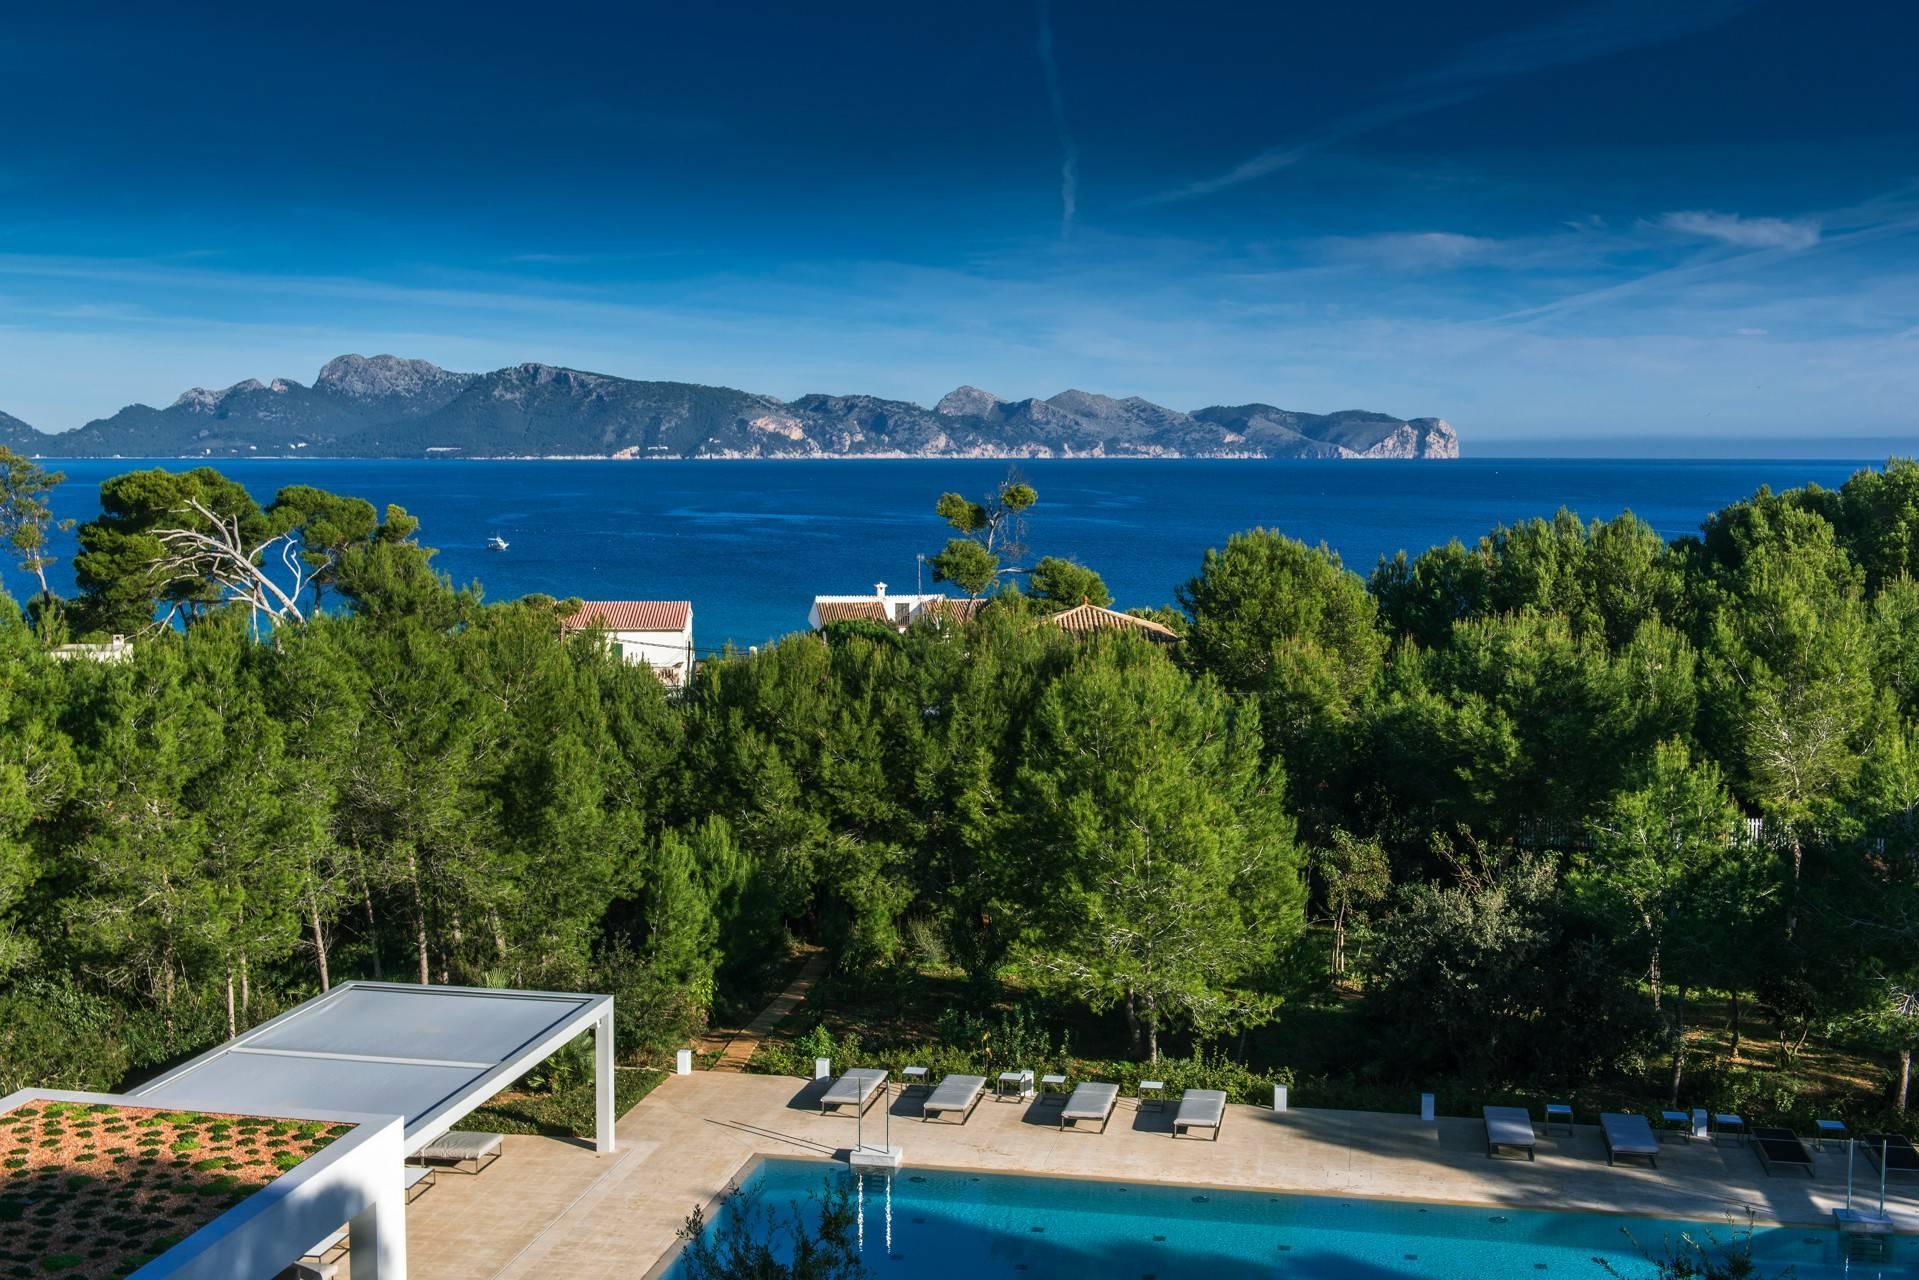 01-250 Extravagant Villa Mallorca North Bild 2